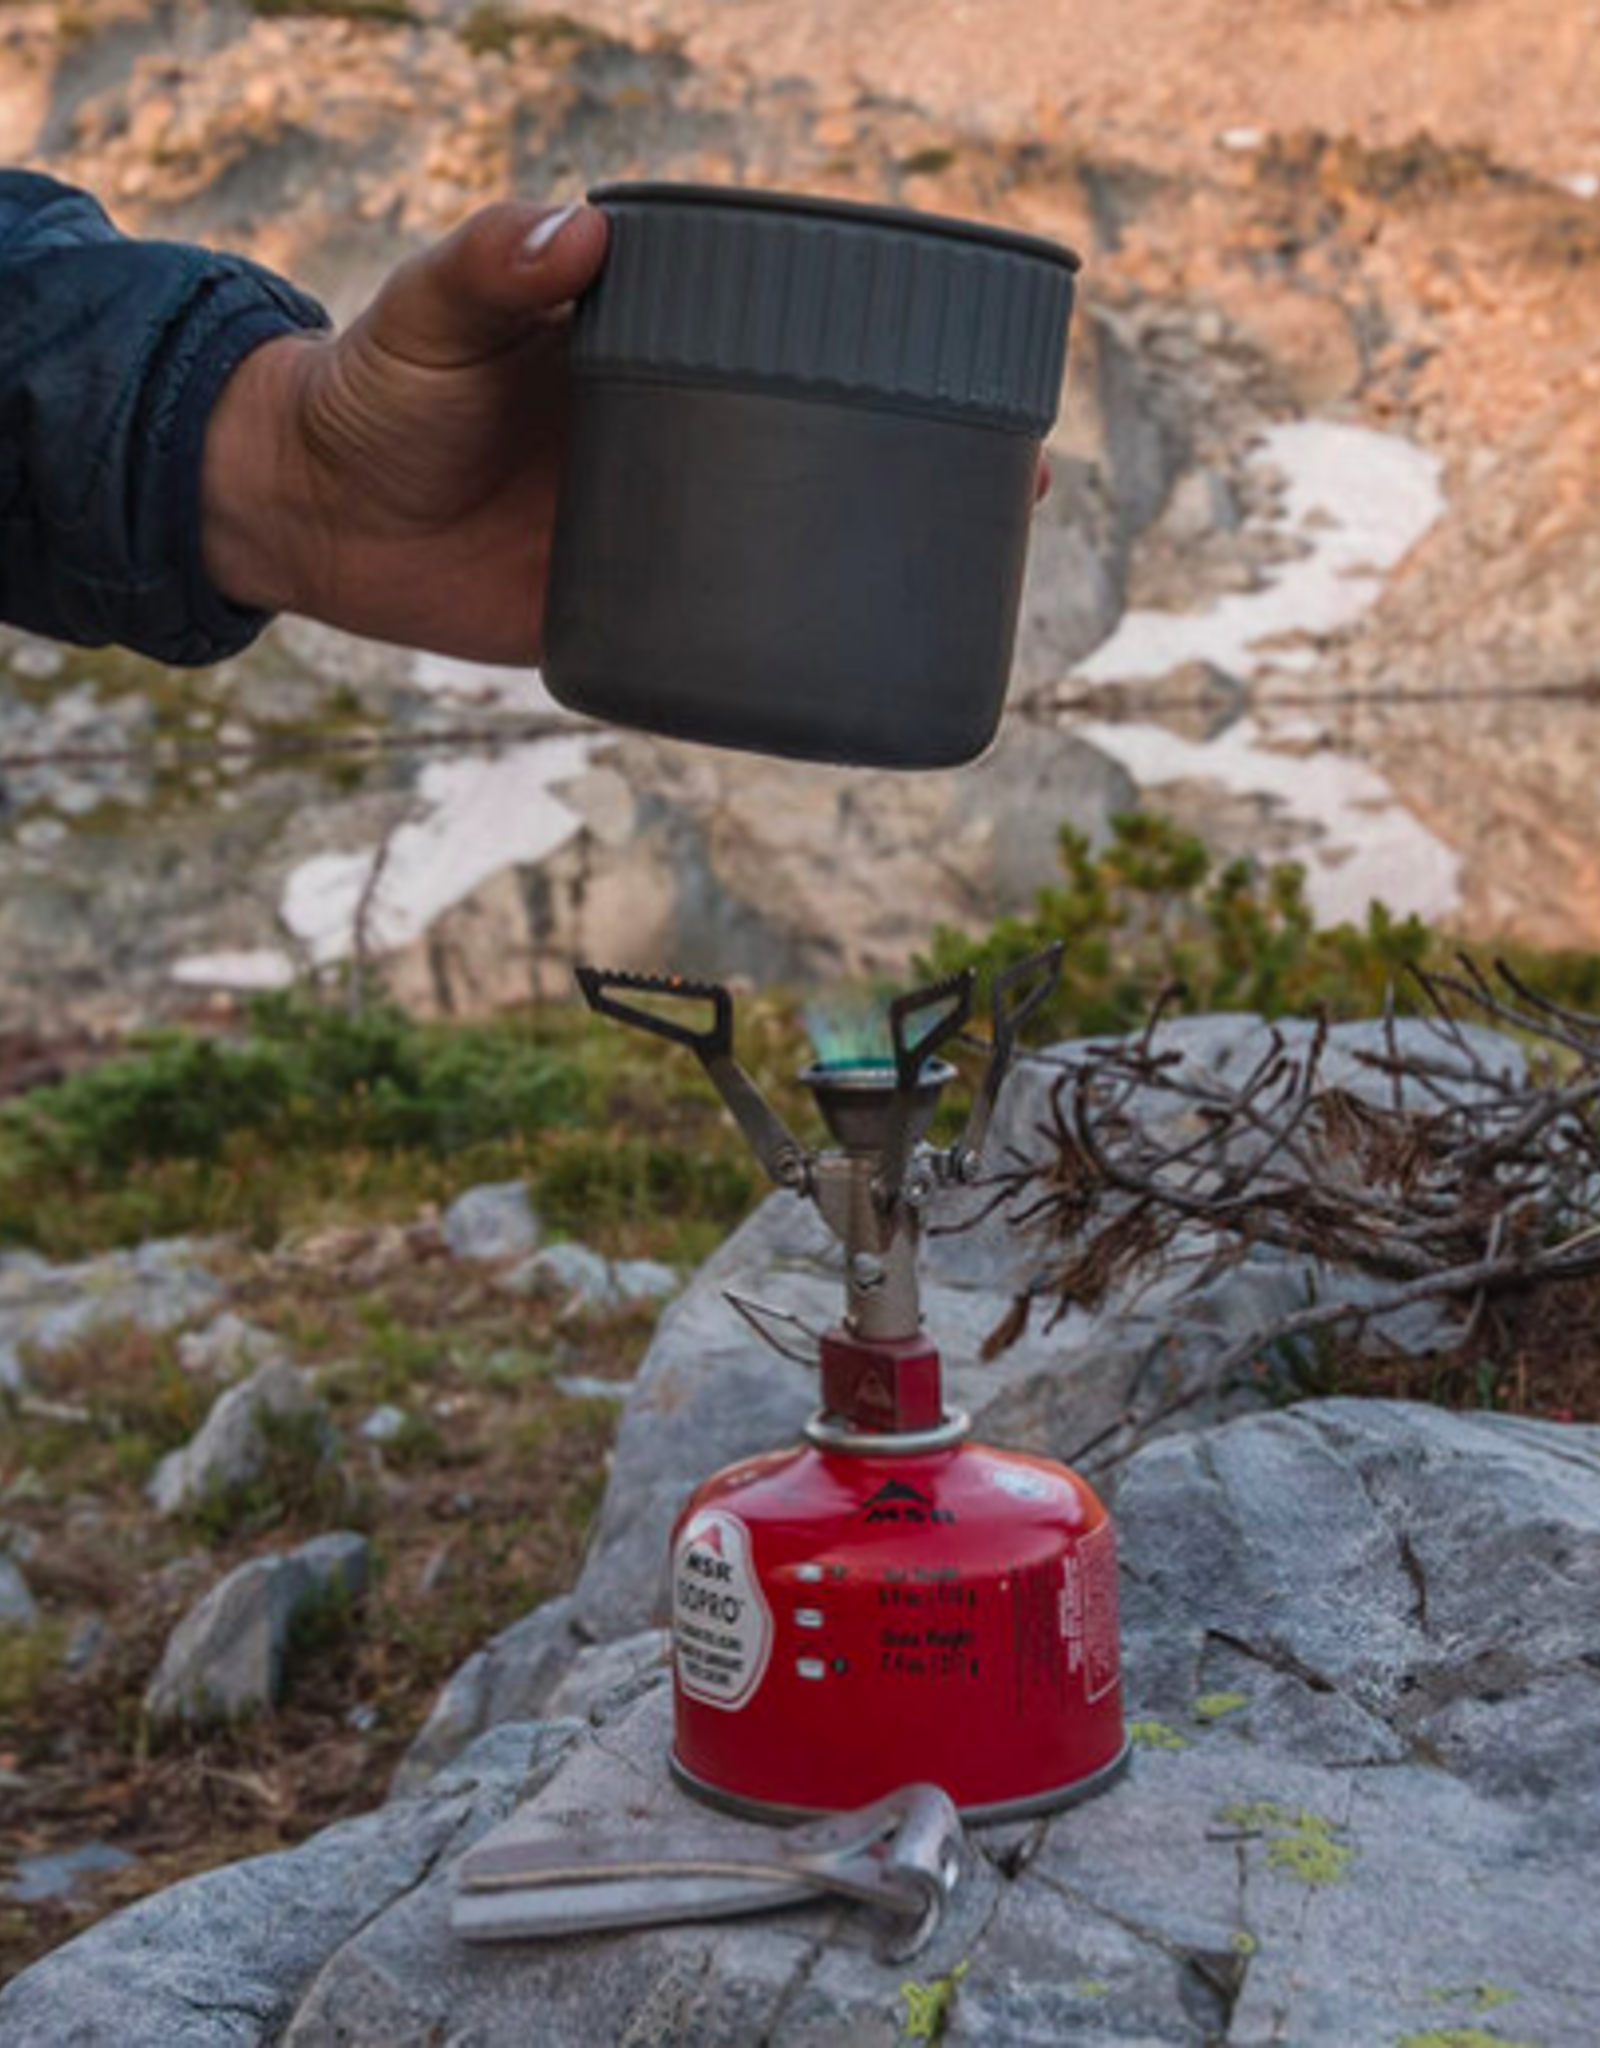 MSR Trail Mini Solo Cook Set - .8 Liter